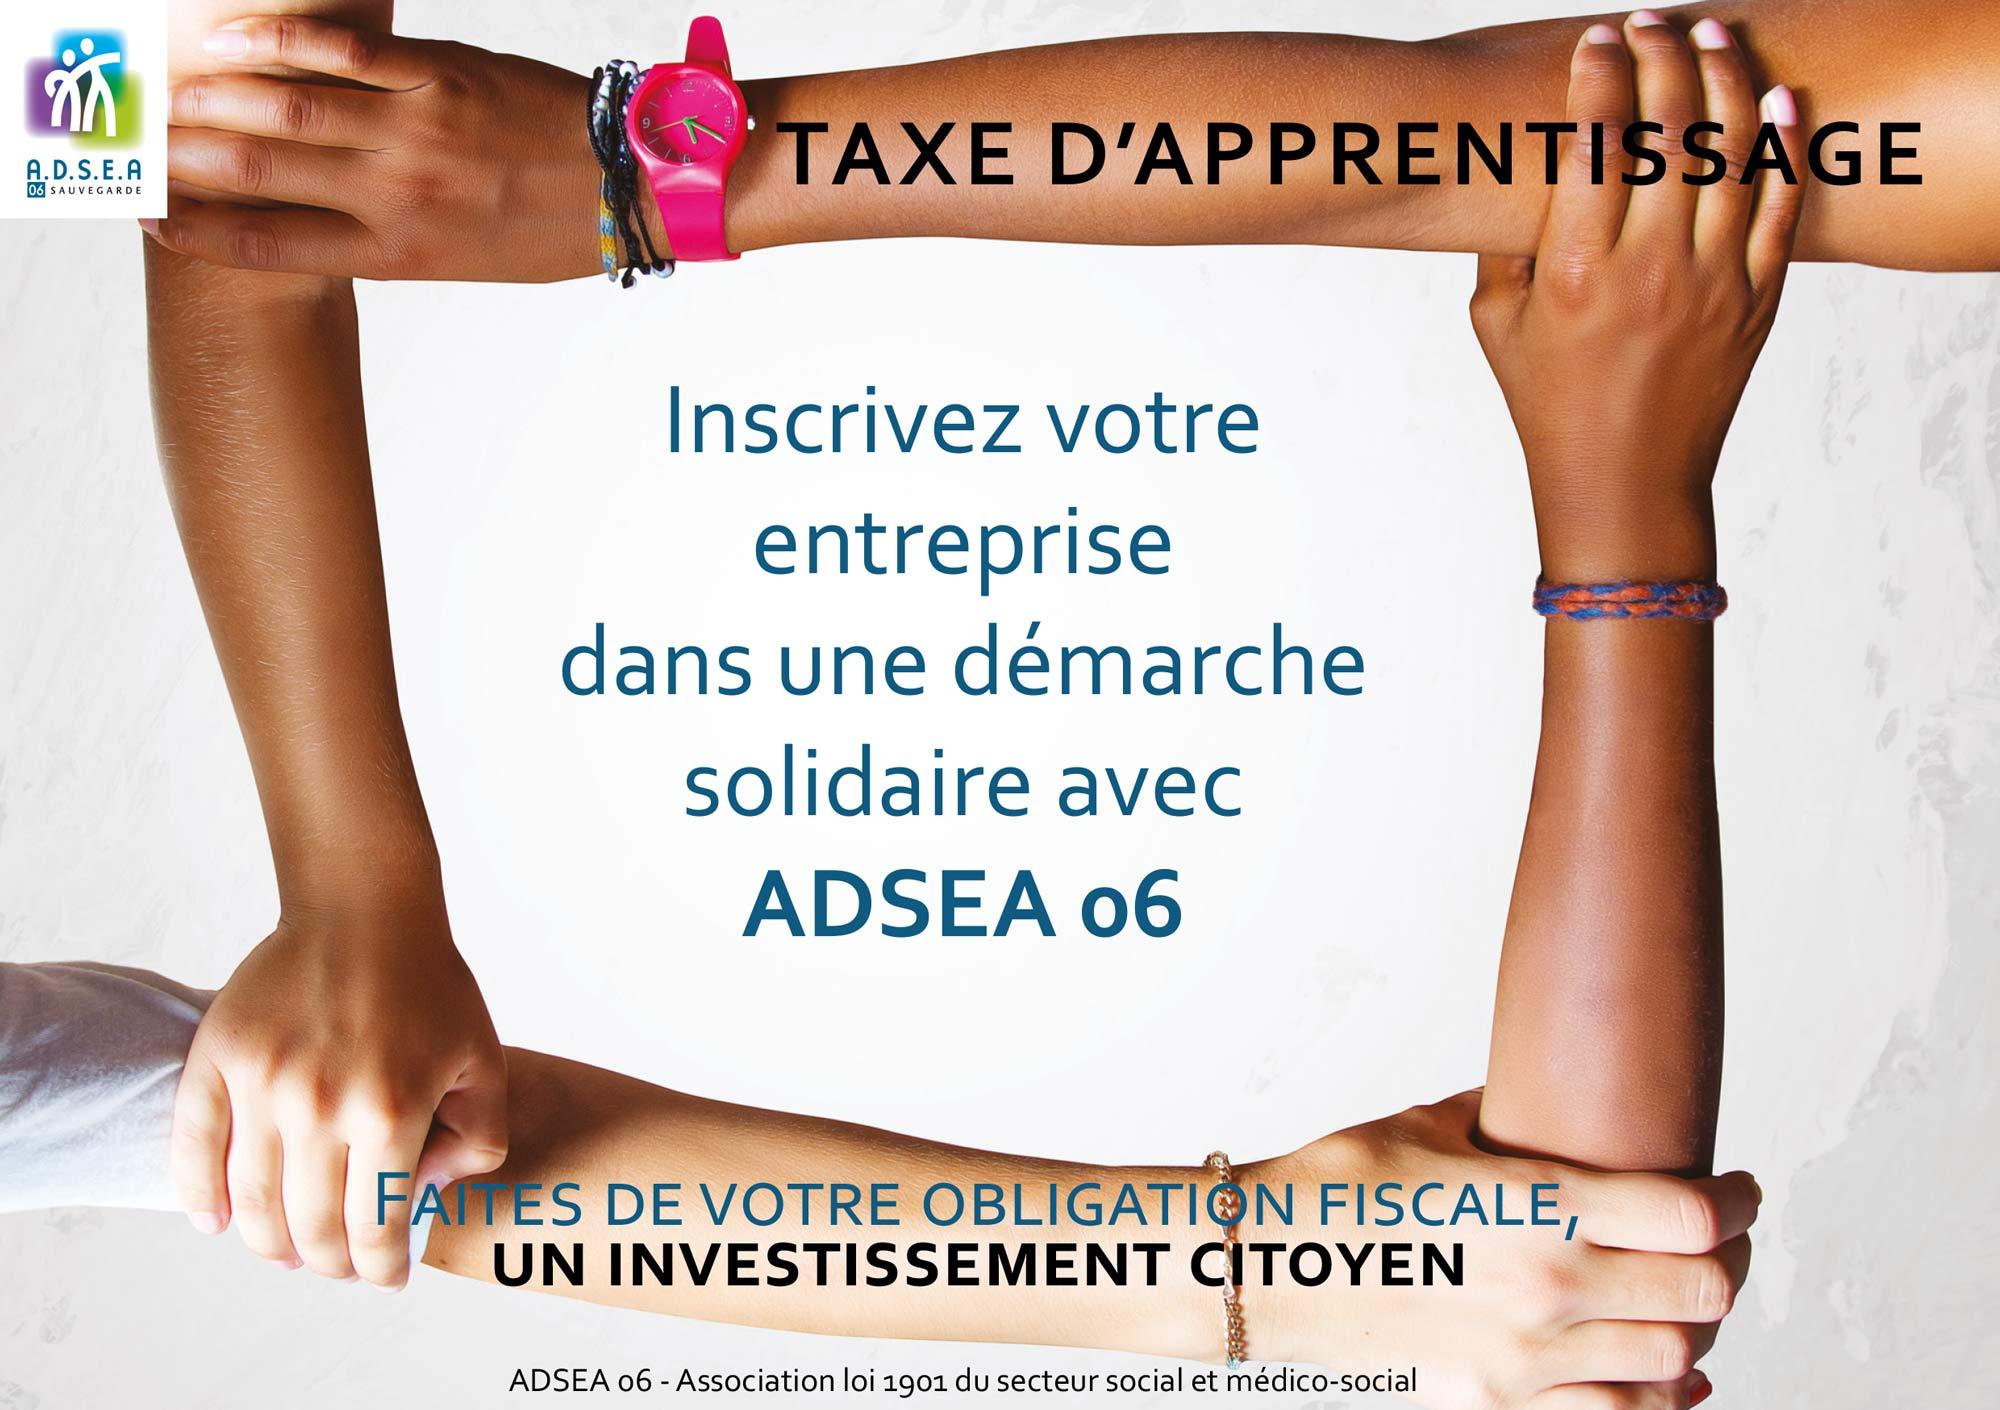 flyer-Taxe-apprentissage-2017web-(1)-(1)-1